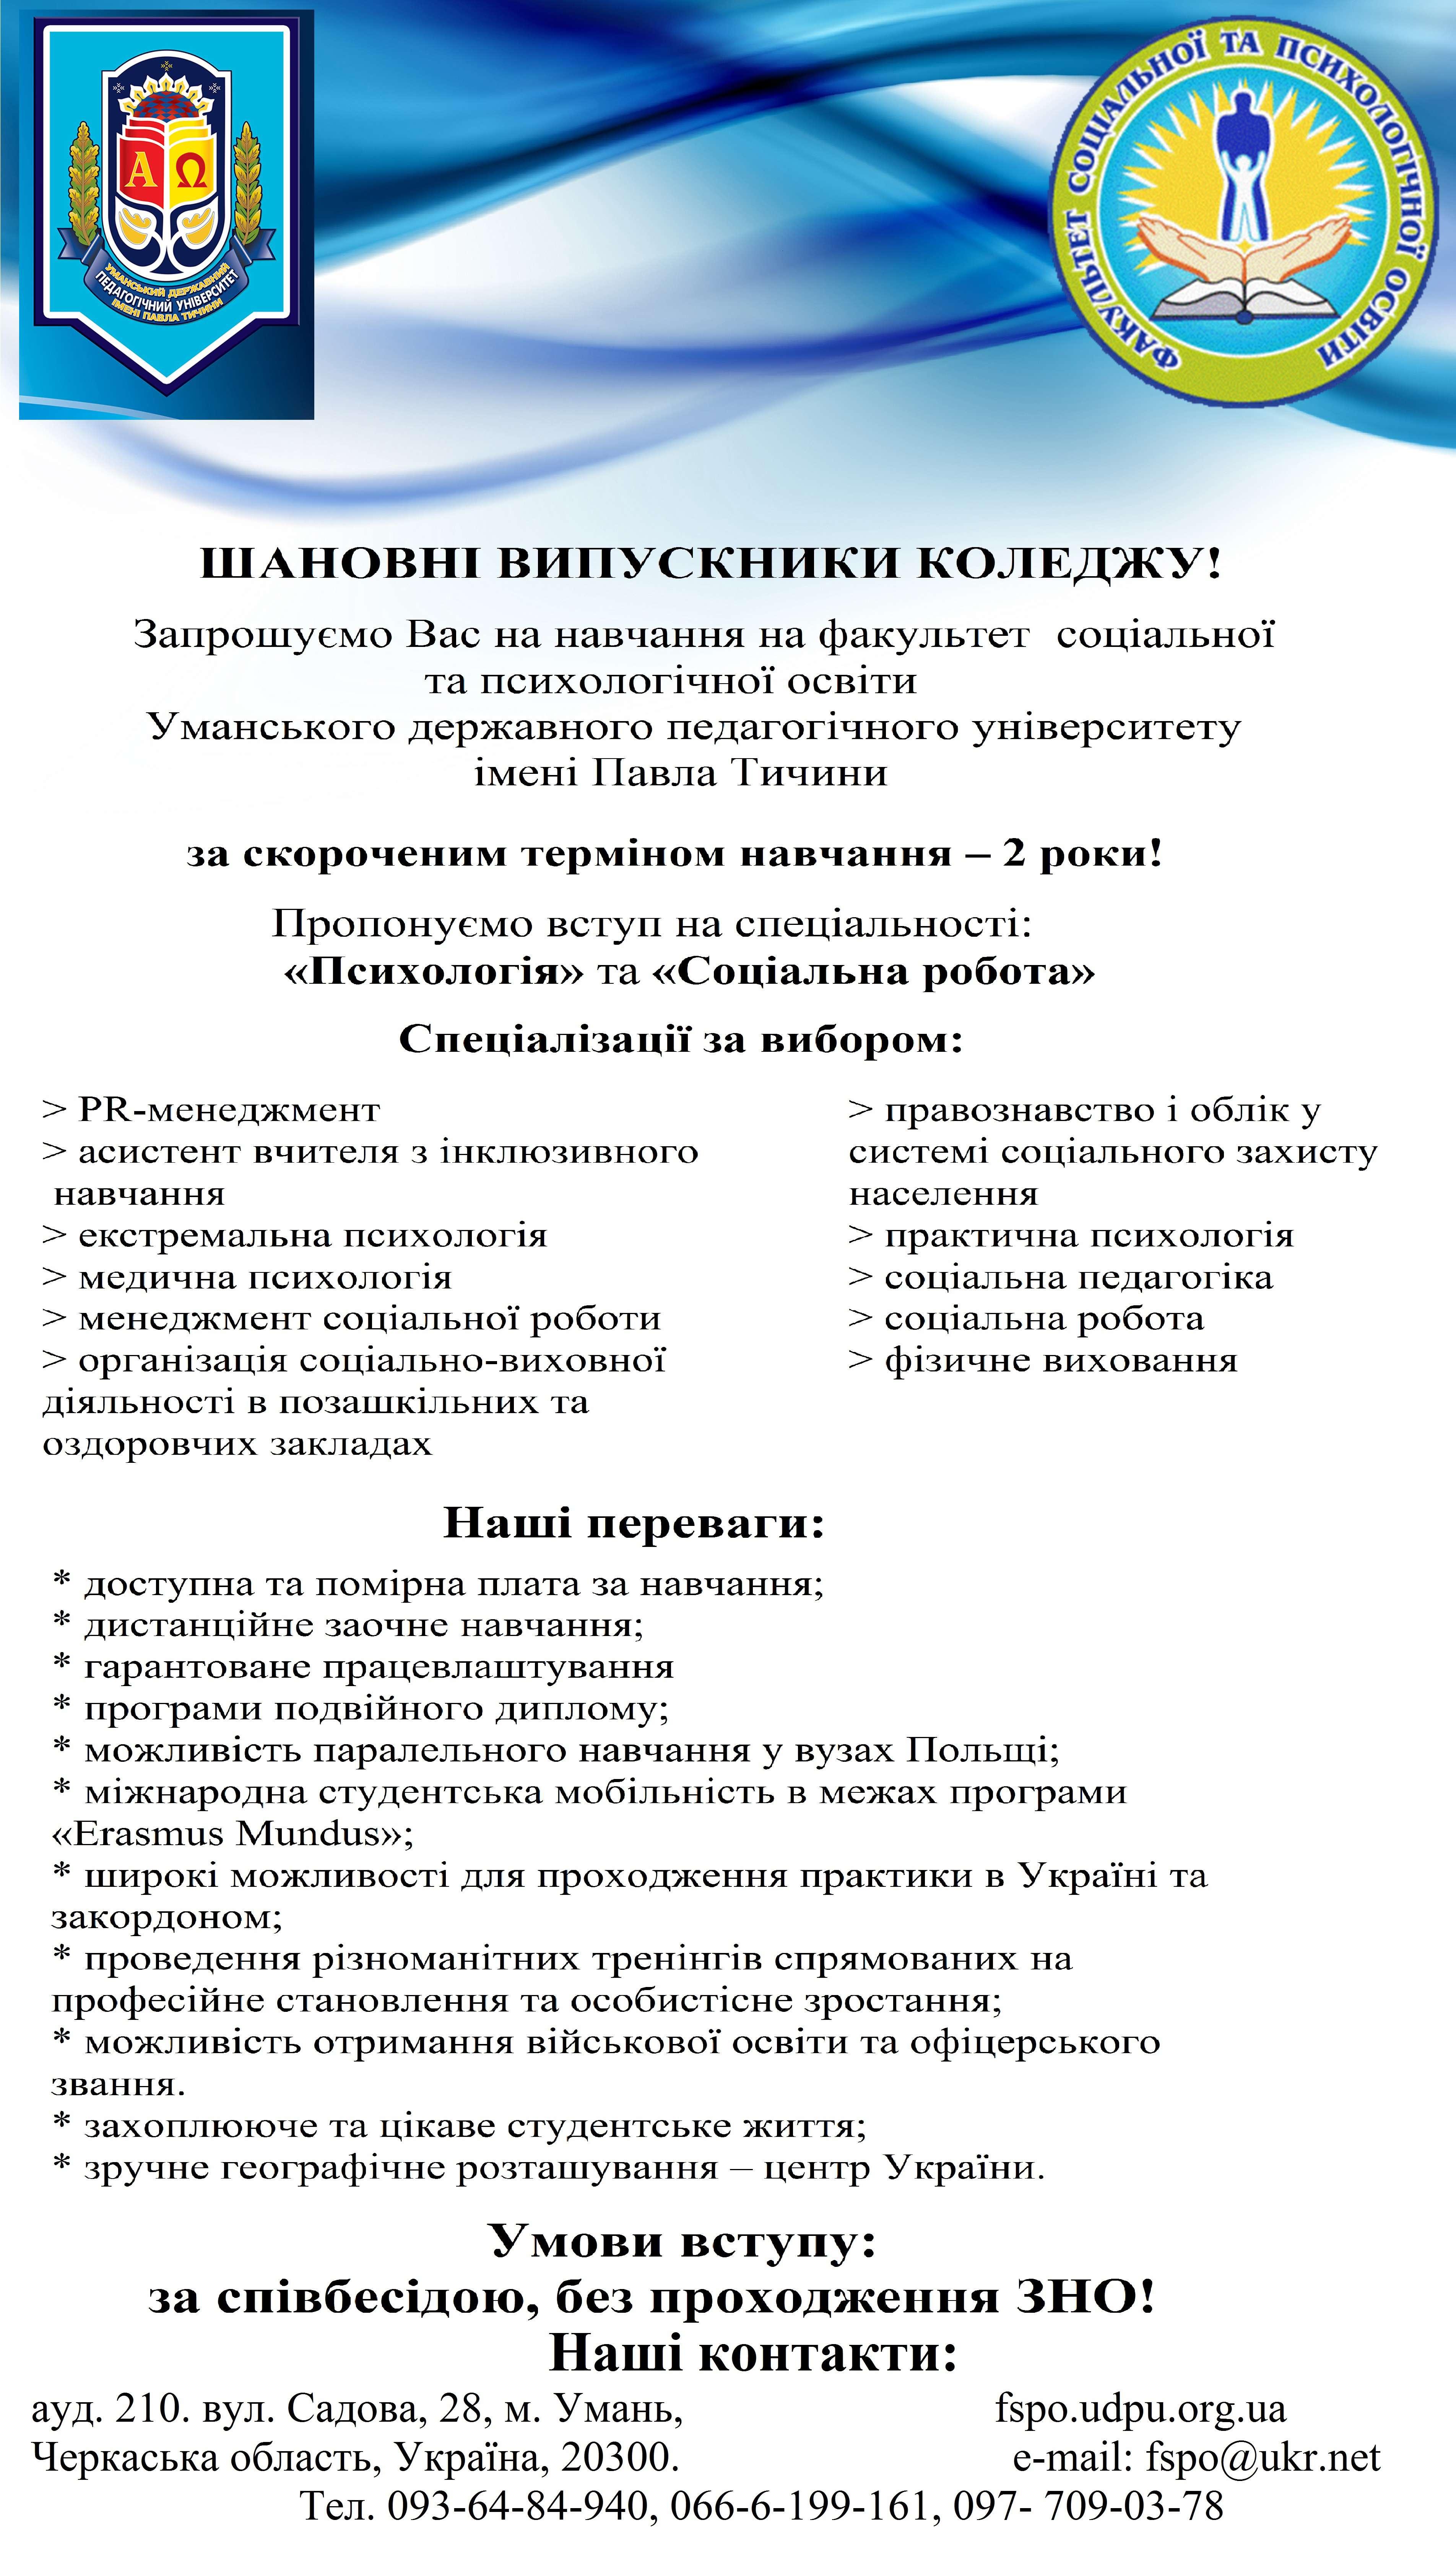 (о_о)